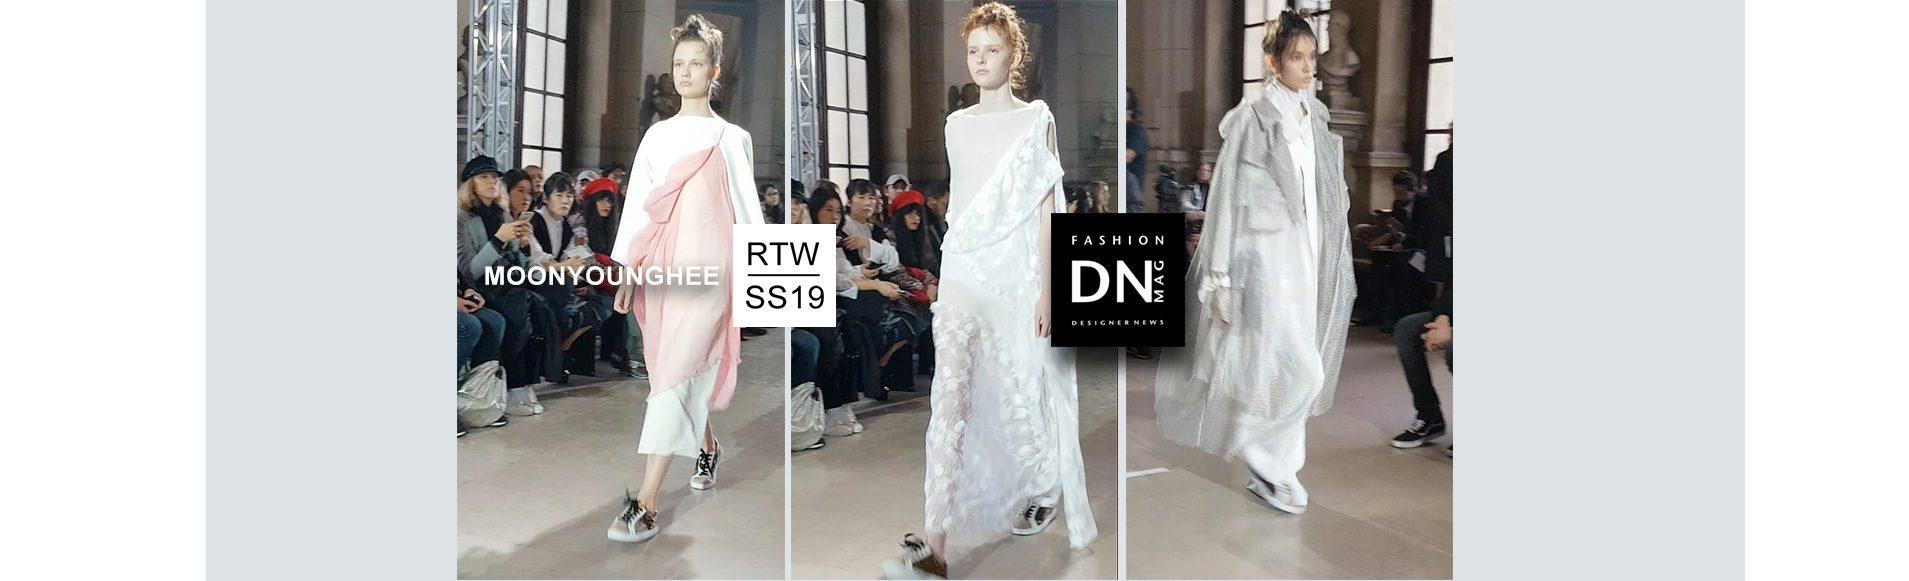 DNMAG-moonyounghee-PFW-RTW-SS19